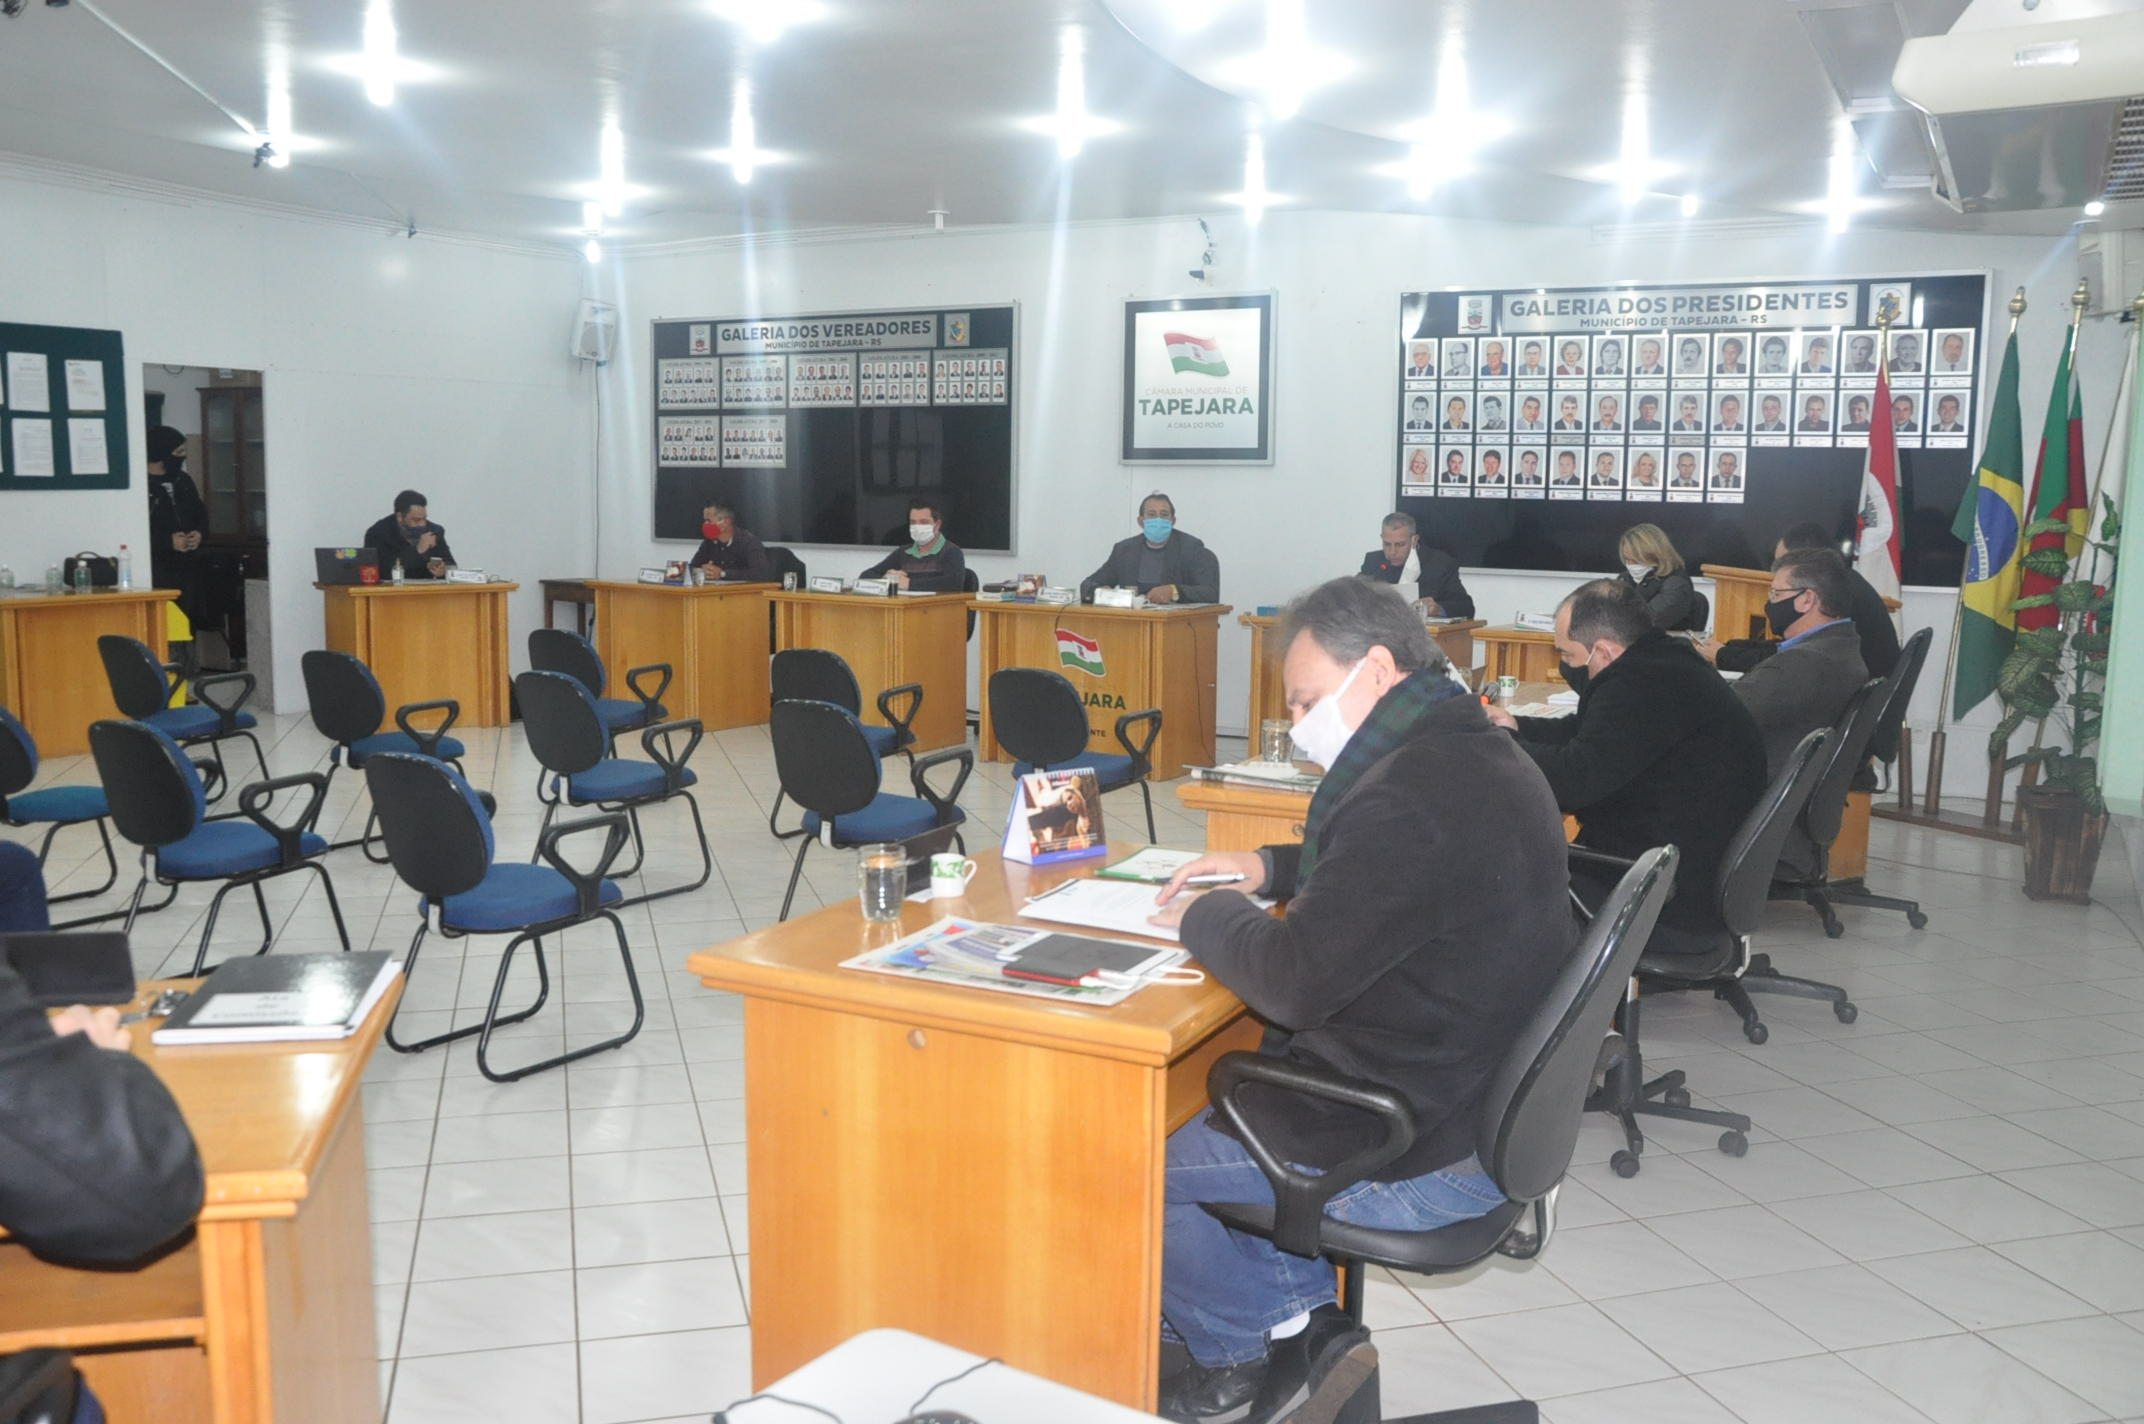 Câmara de Vereadores de Tapejara/RS